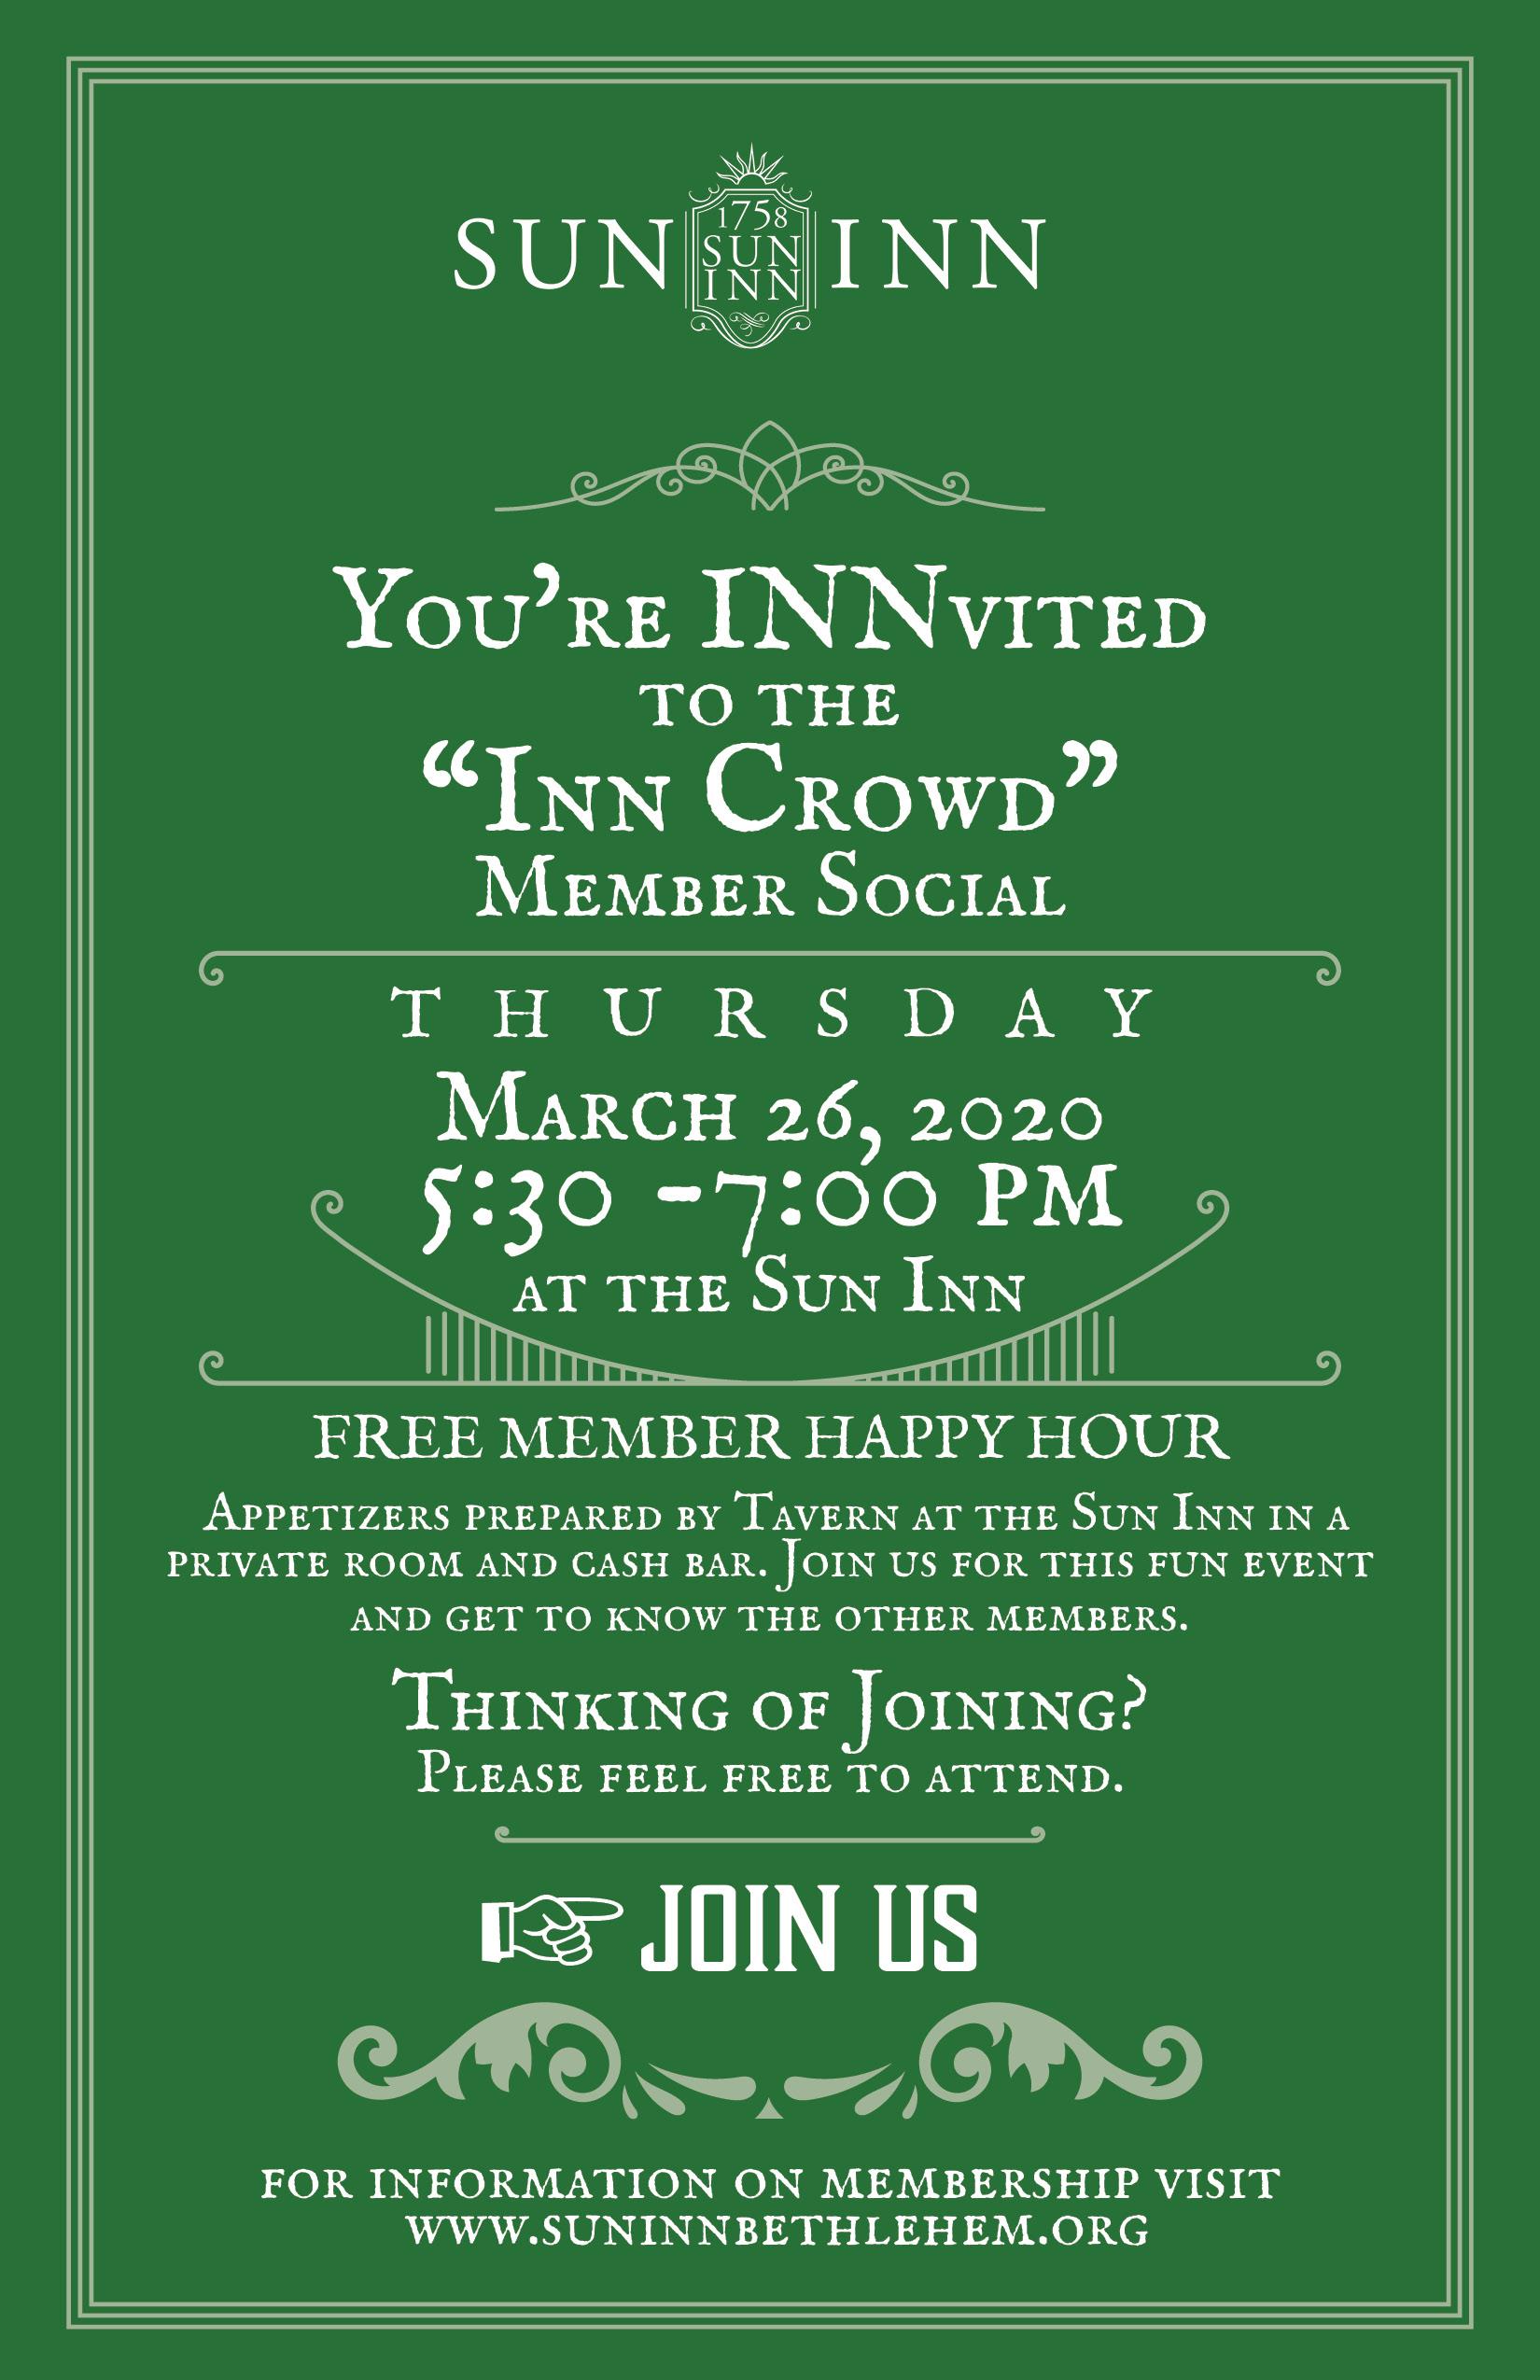 Inn Crowd Invite.March